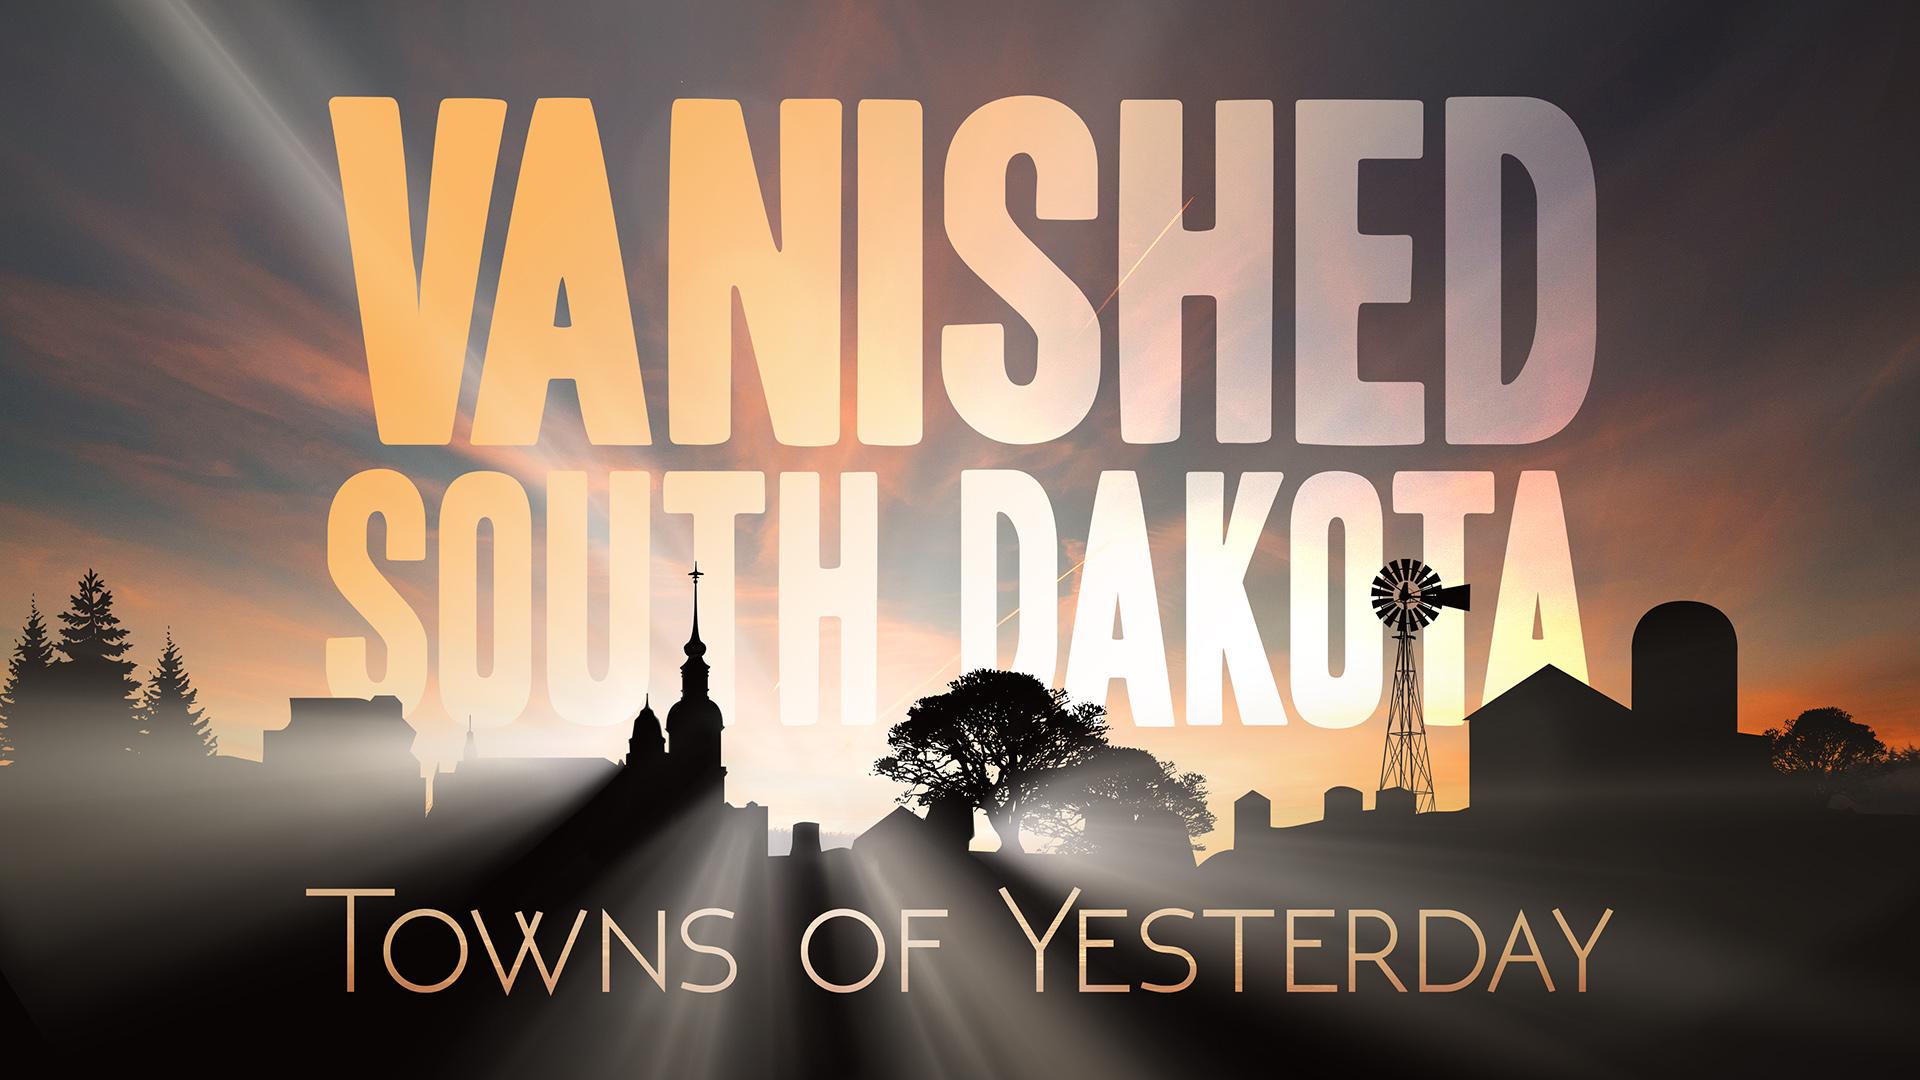 Vanished South Dakota: Towns of Yesterday